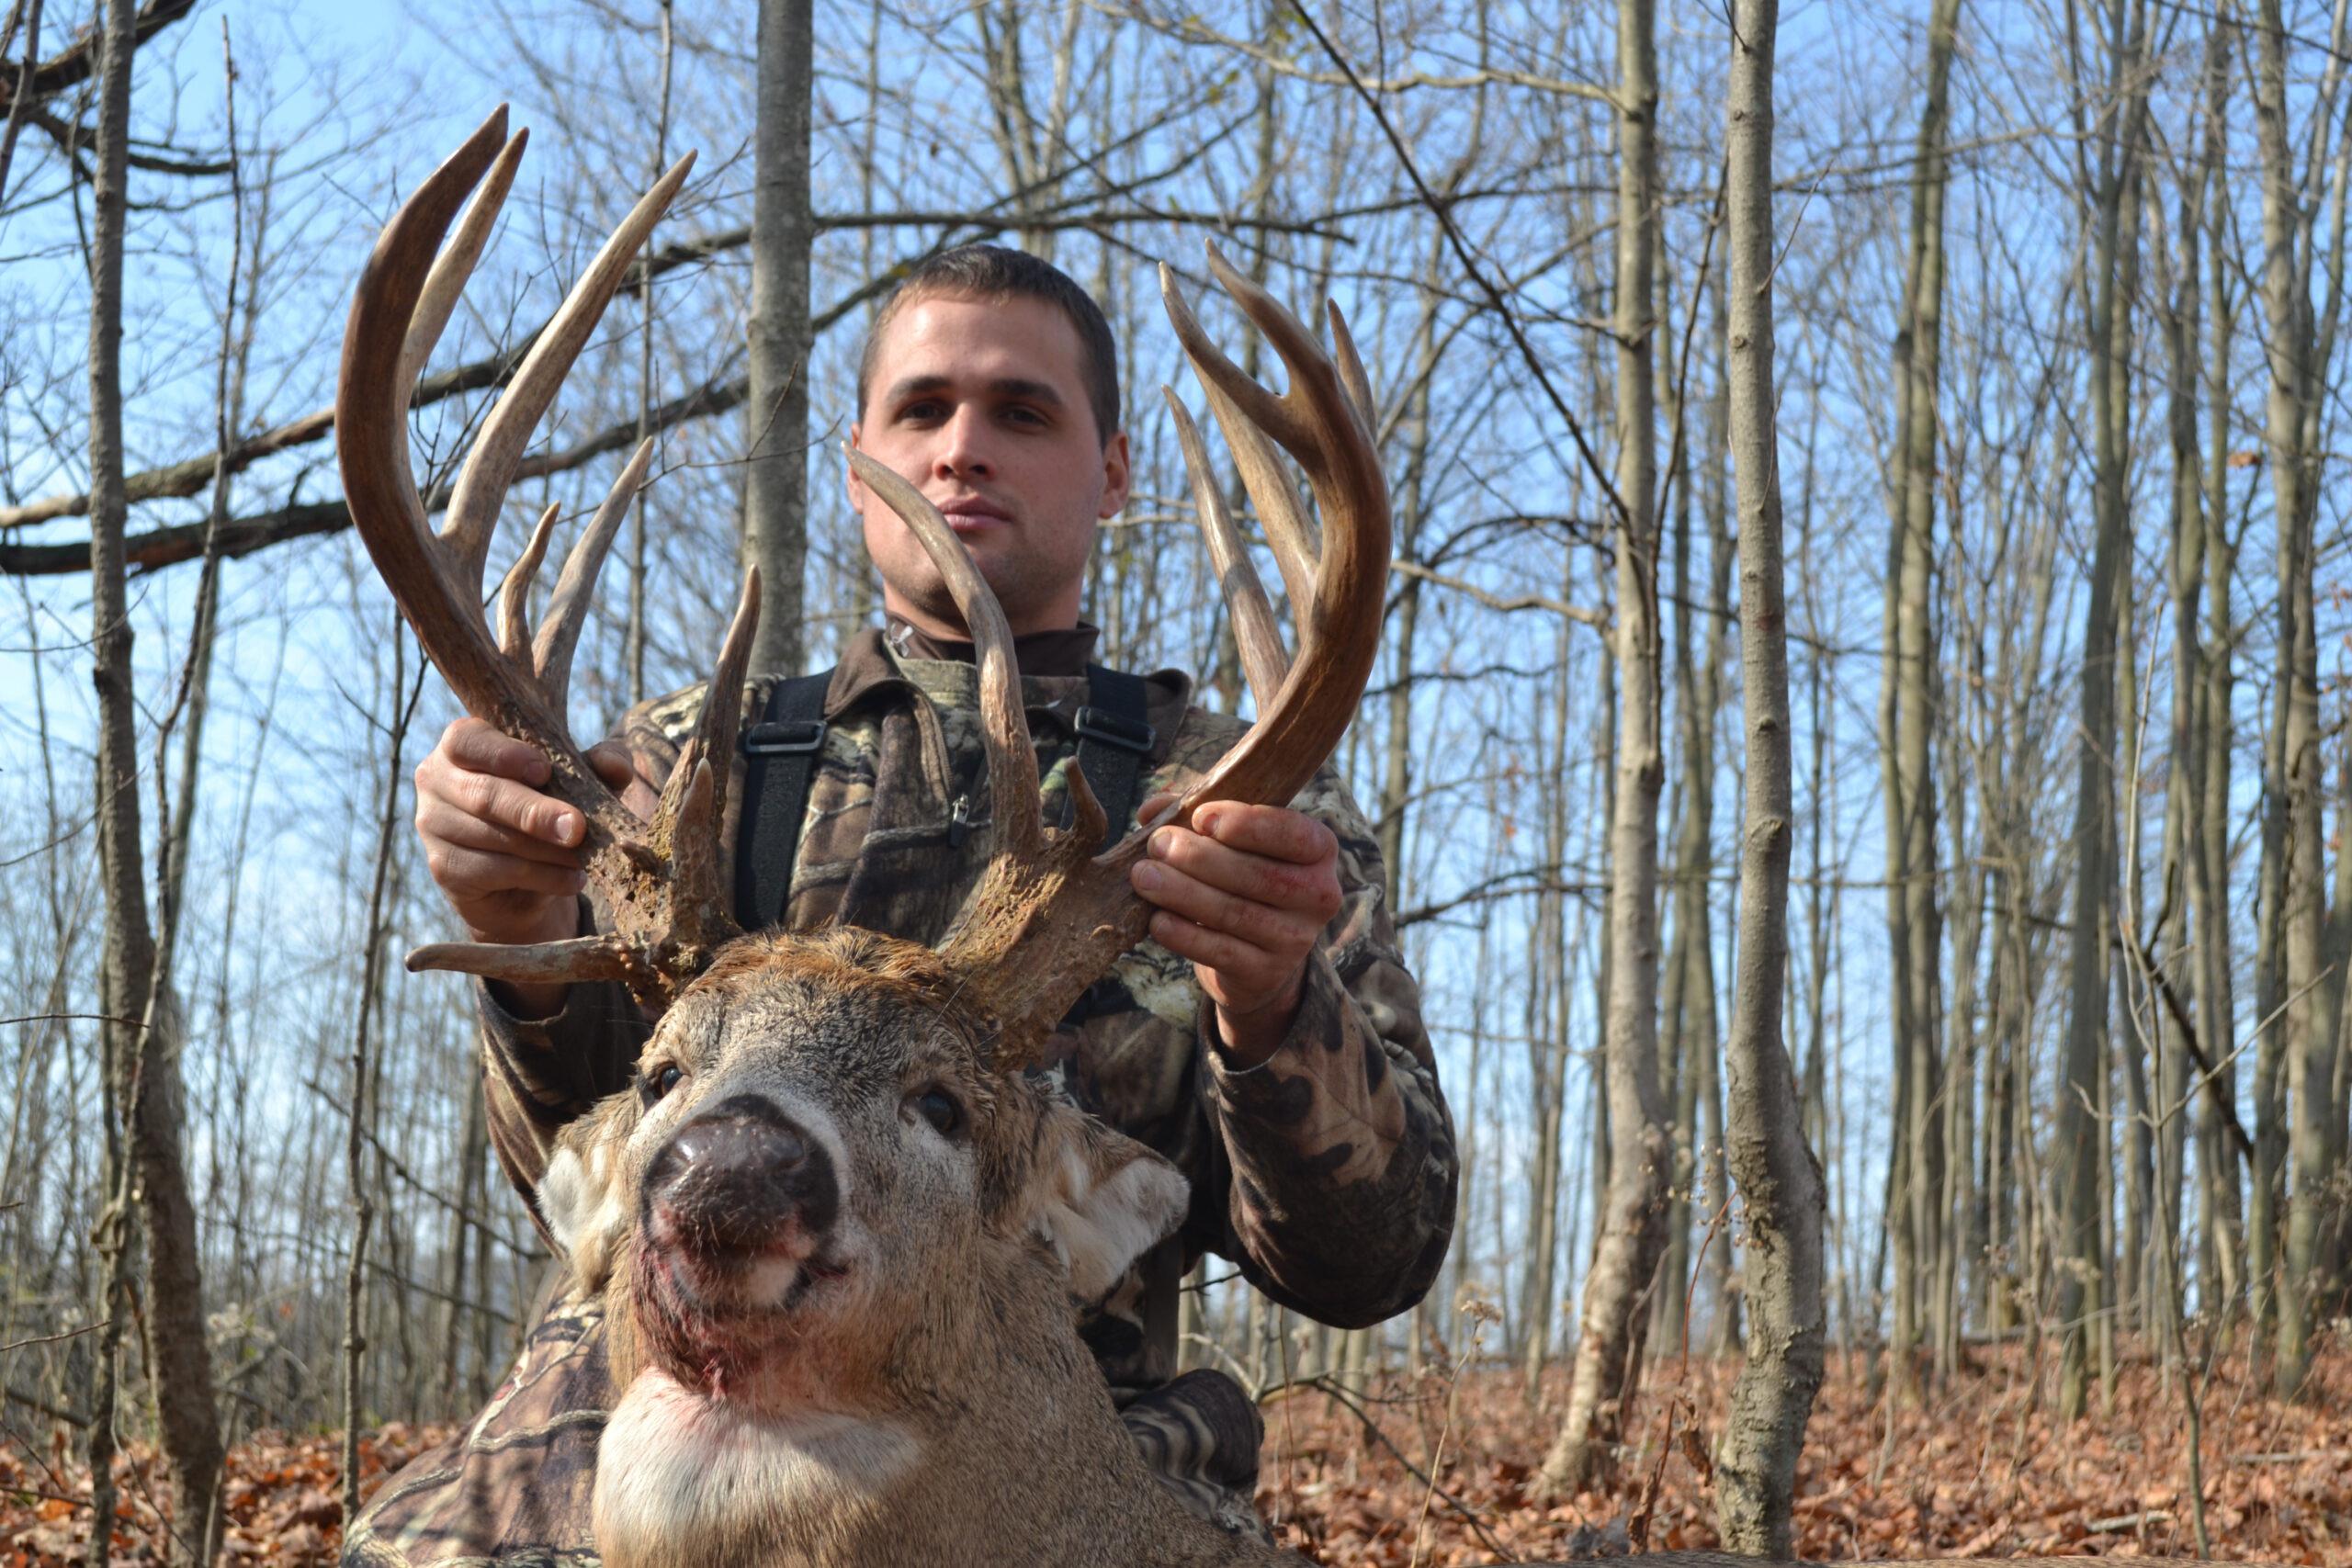 Ohio Deer Rut Predition 2021 | Calendar Printables Free Blank-Florida 2021 Deer Rut Prediction